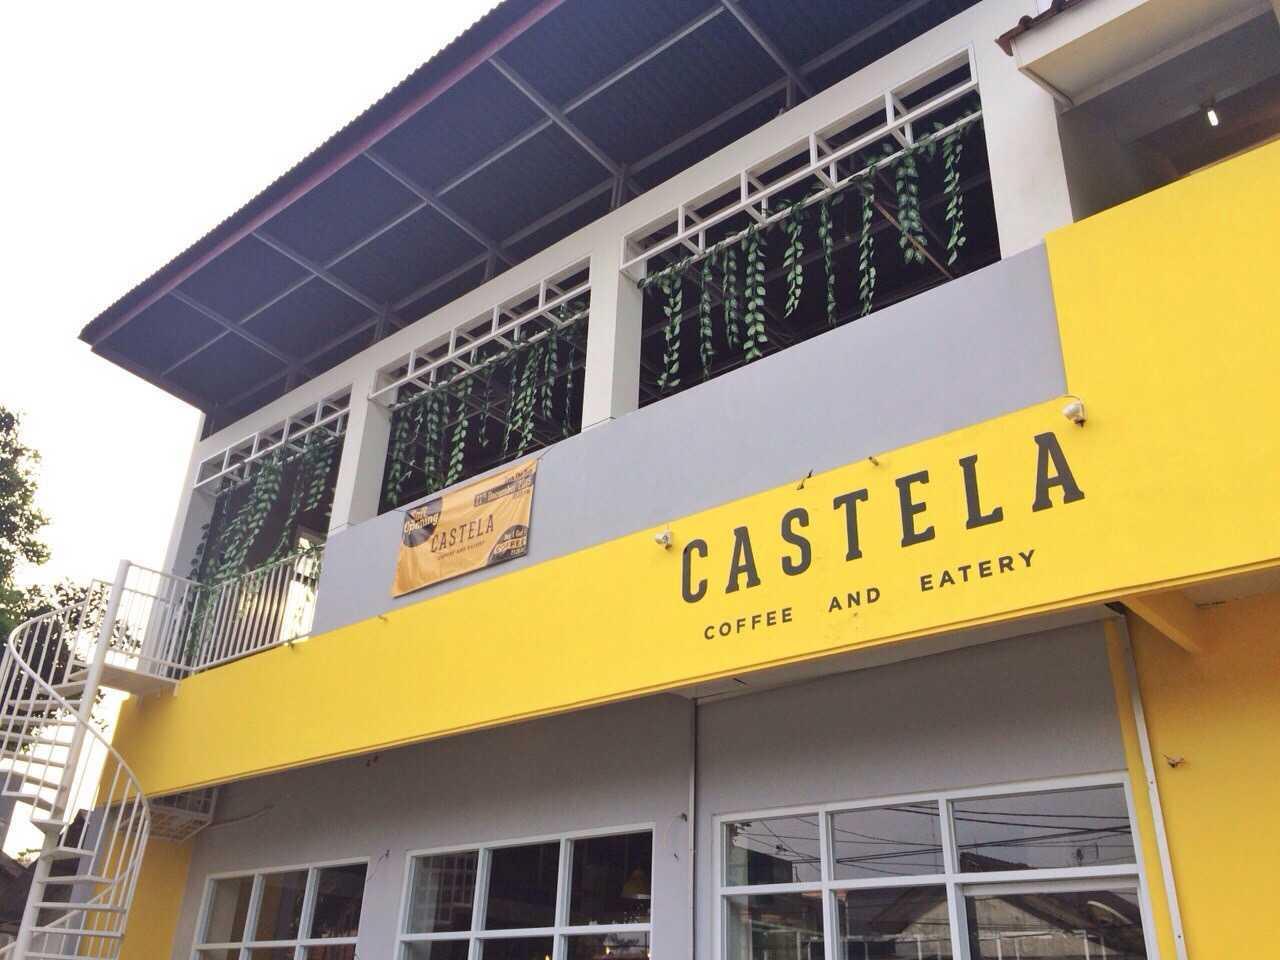 Sia Living Castella Eatery Depok, Kota Depok, Jawa Barat, Indonesia  Exterior View Contemporary 46635